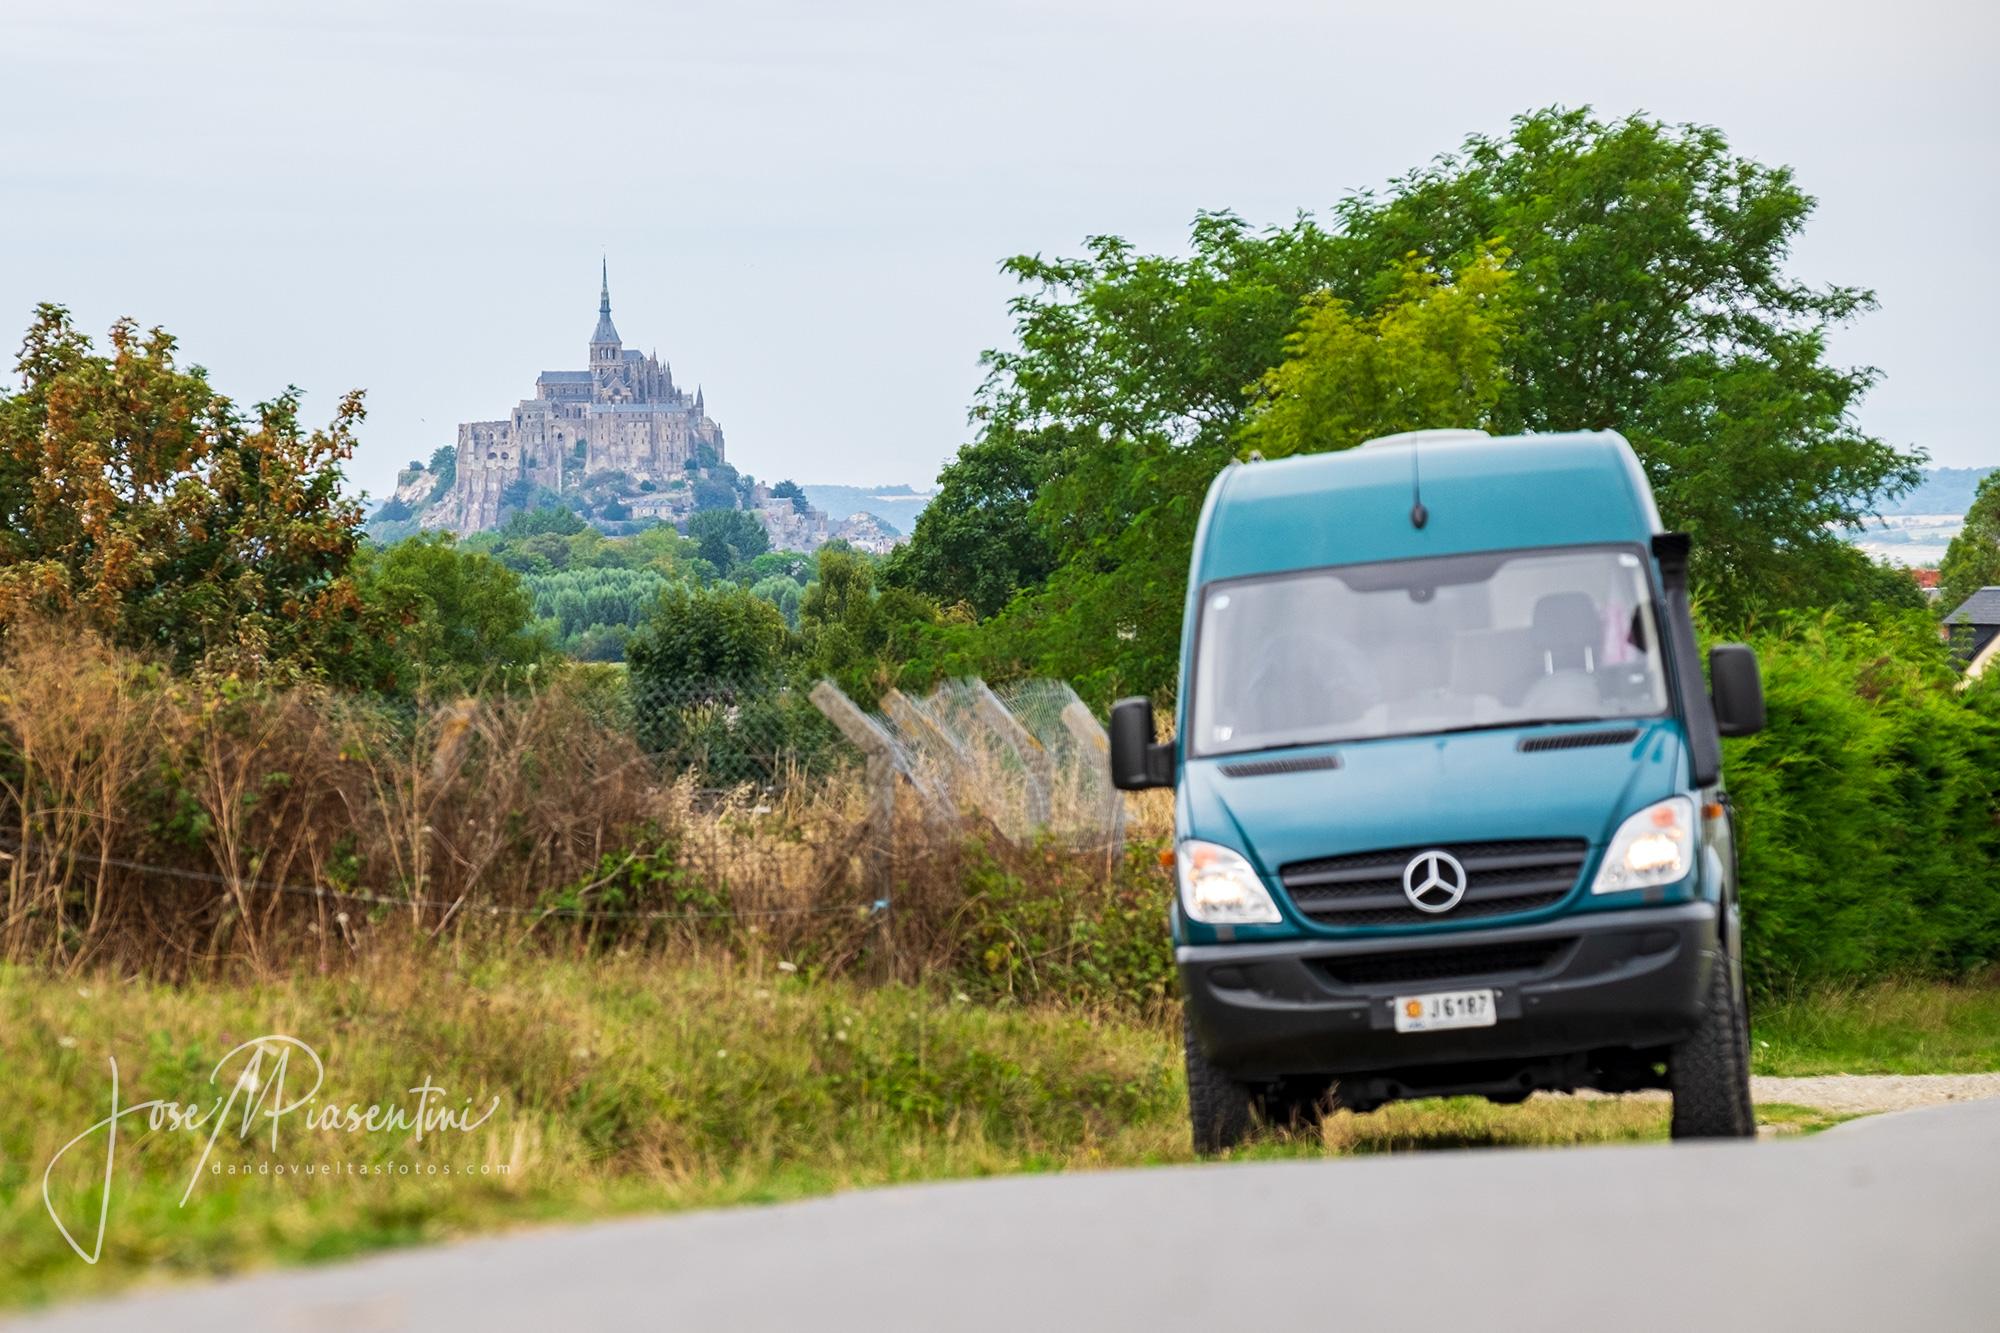 Cómo acceder a Mont Saint Michel en furgoneta